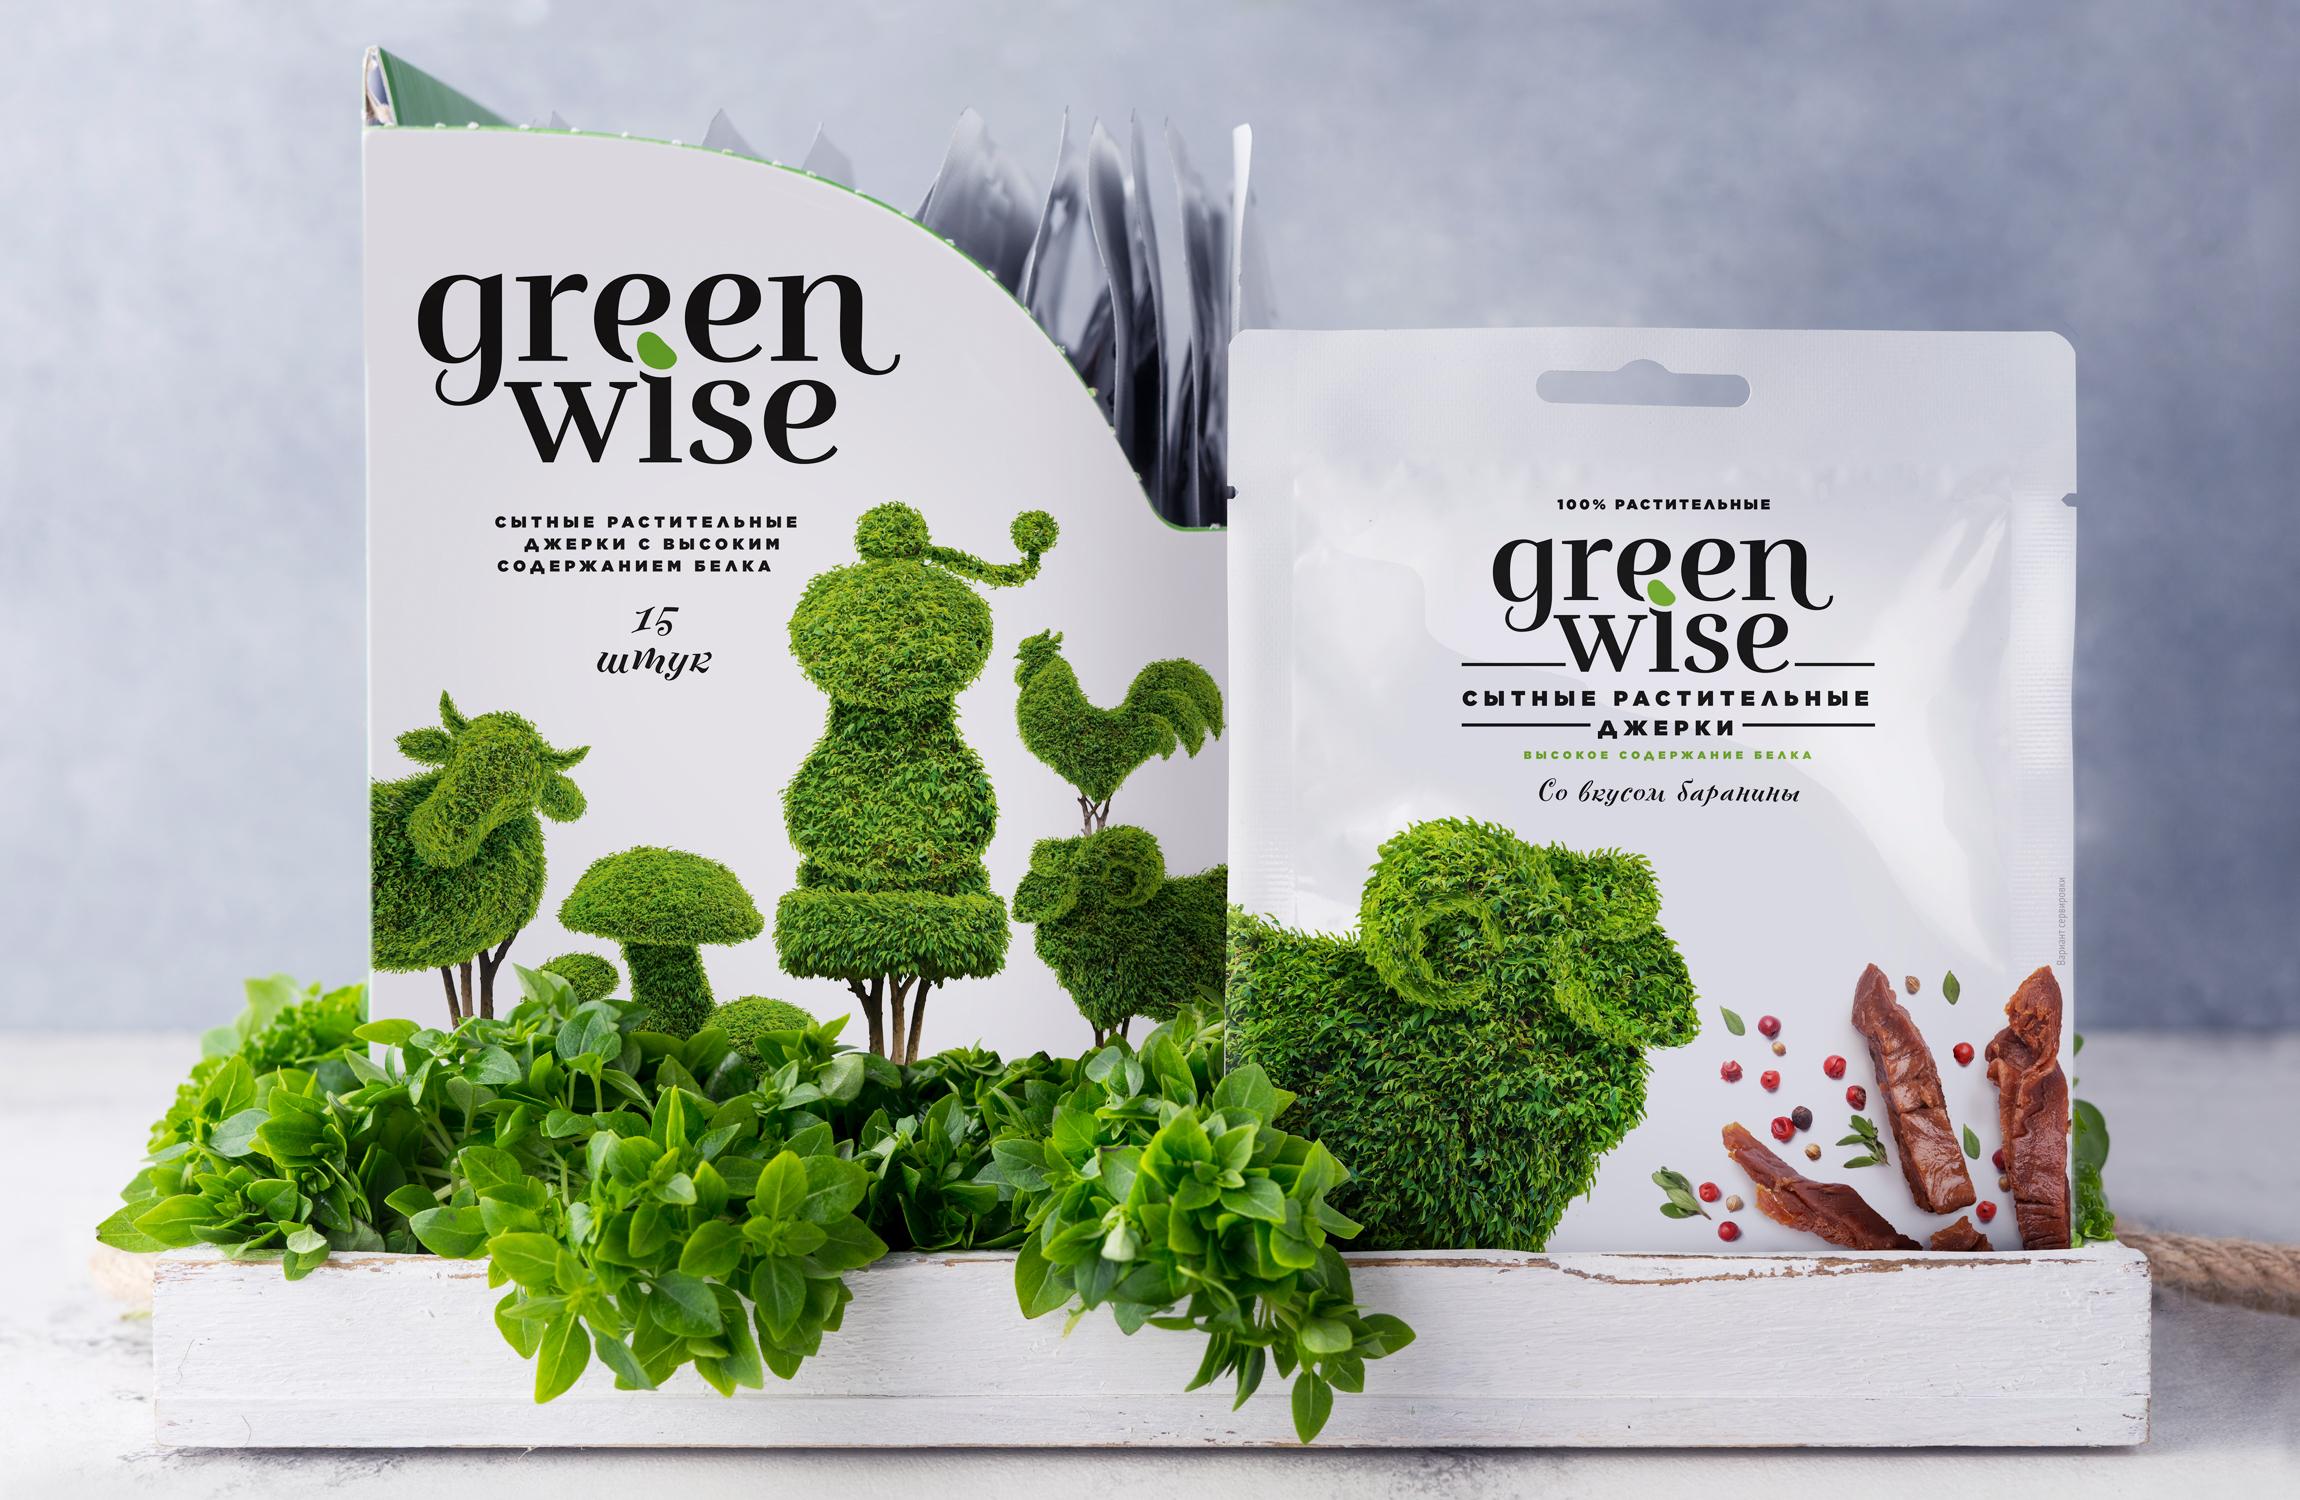 greenwise-5